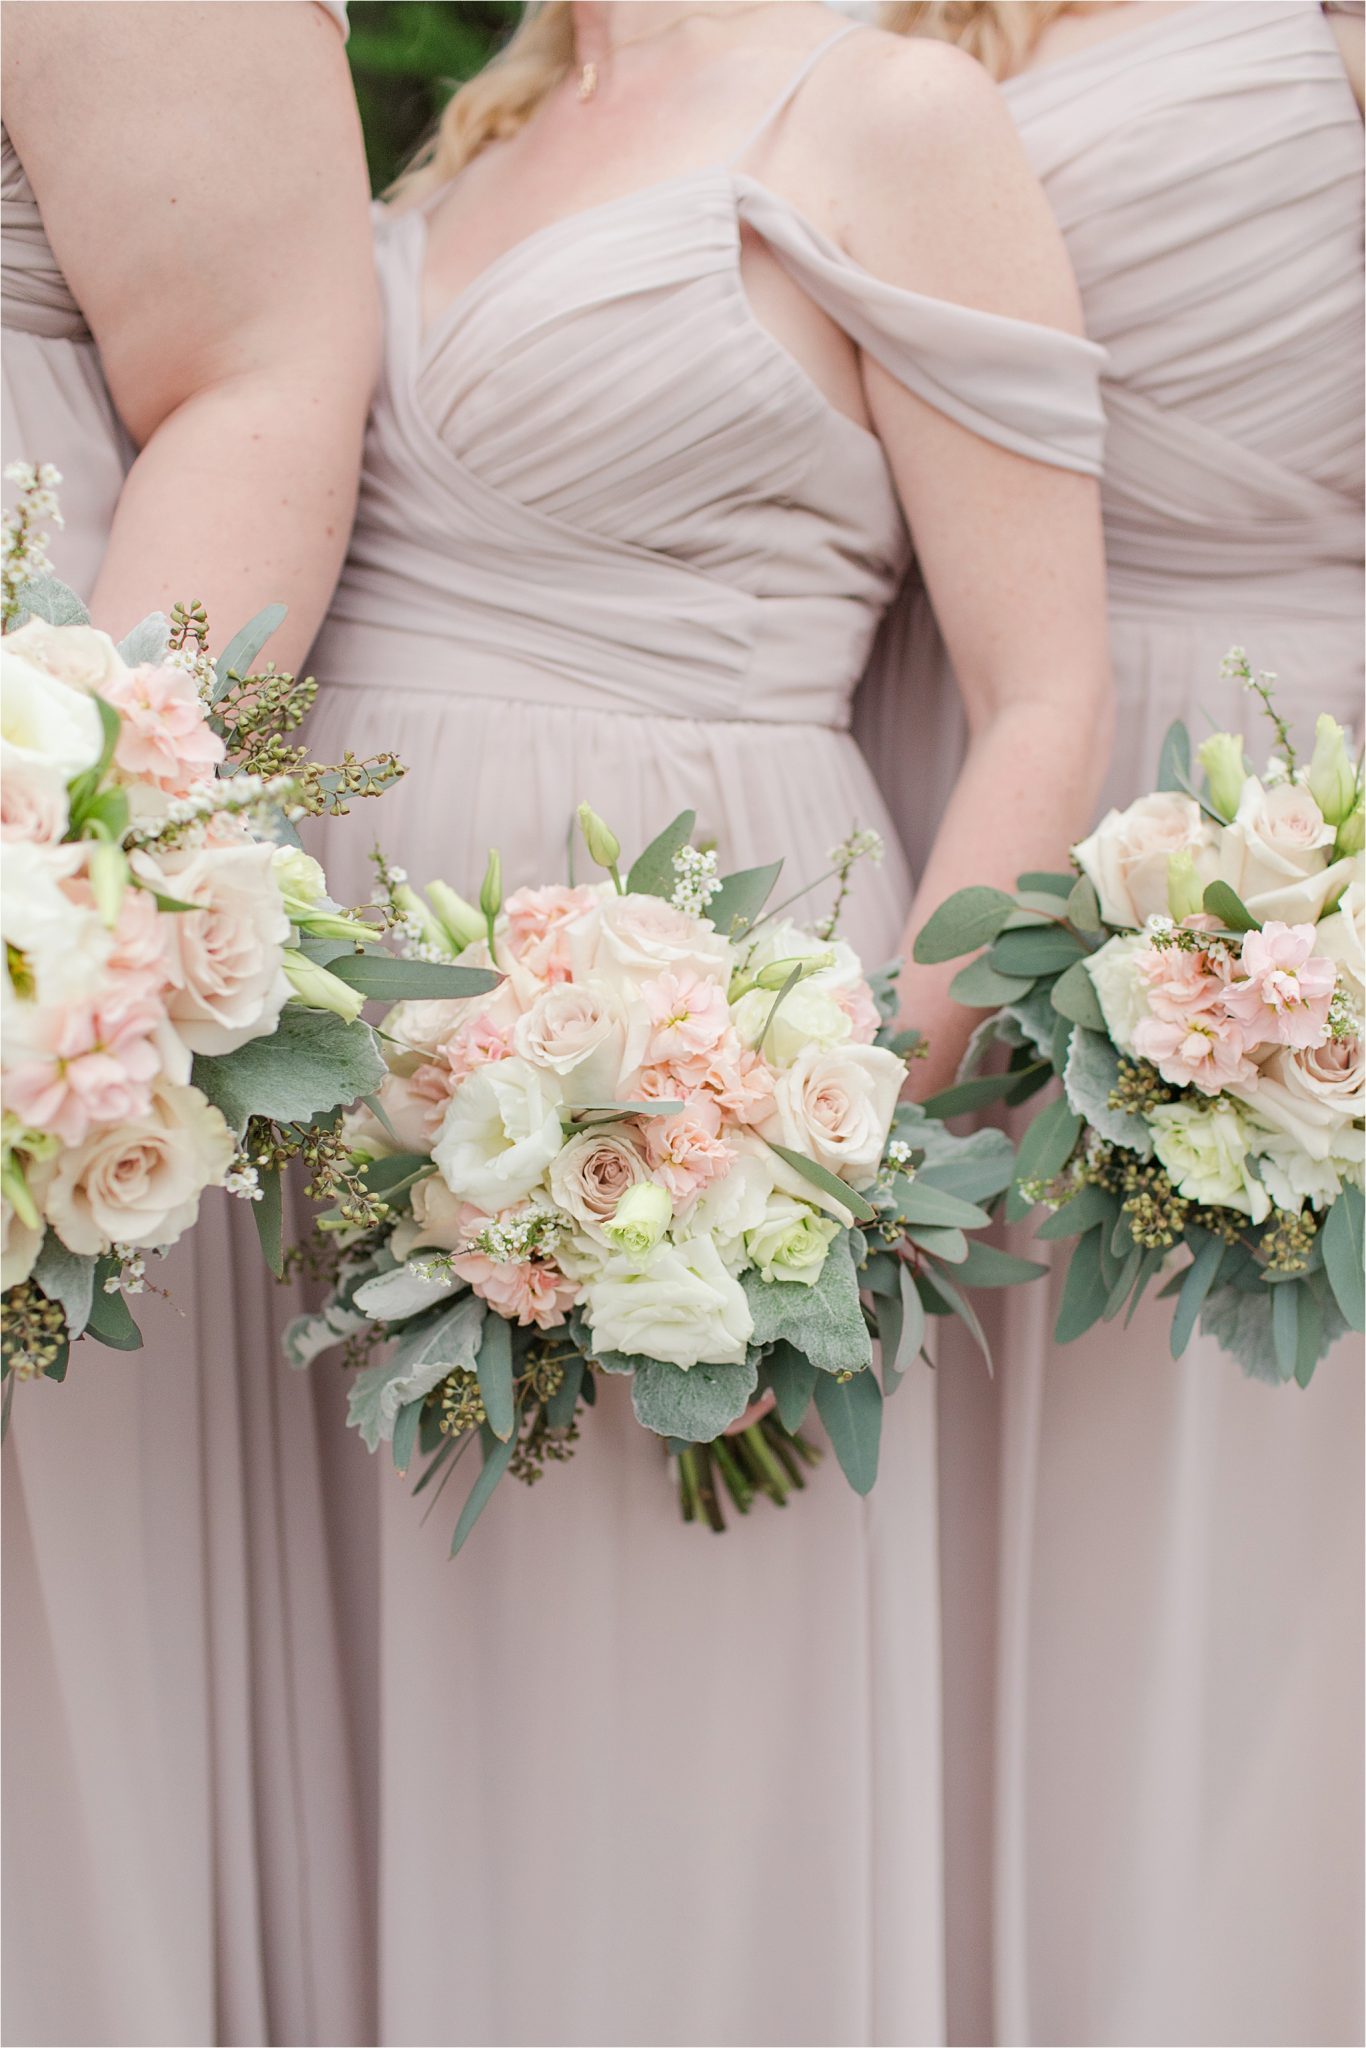 blush bouquet-blush and neutrals-wedding-bridesmaid dresses-draping shoulder bridesmaid dresses